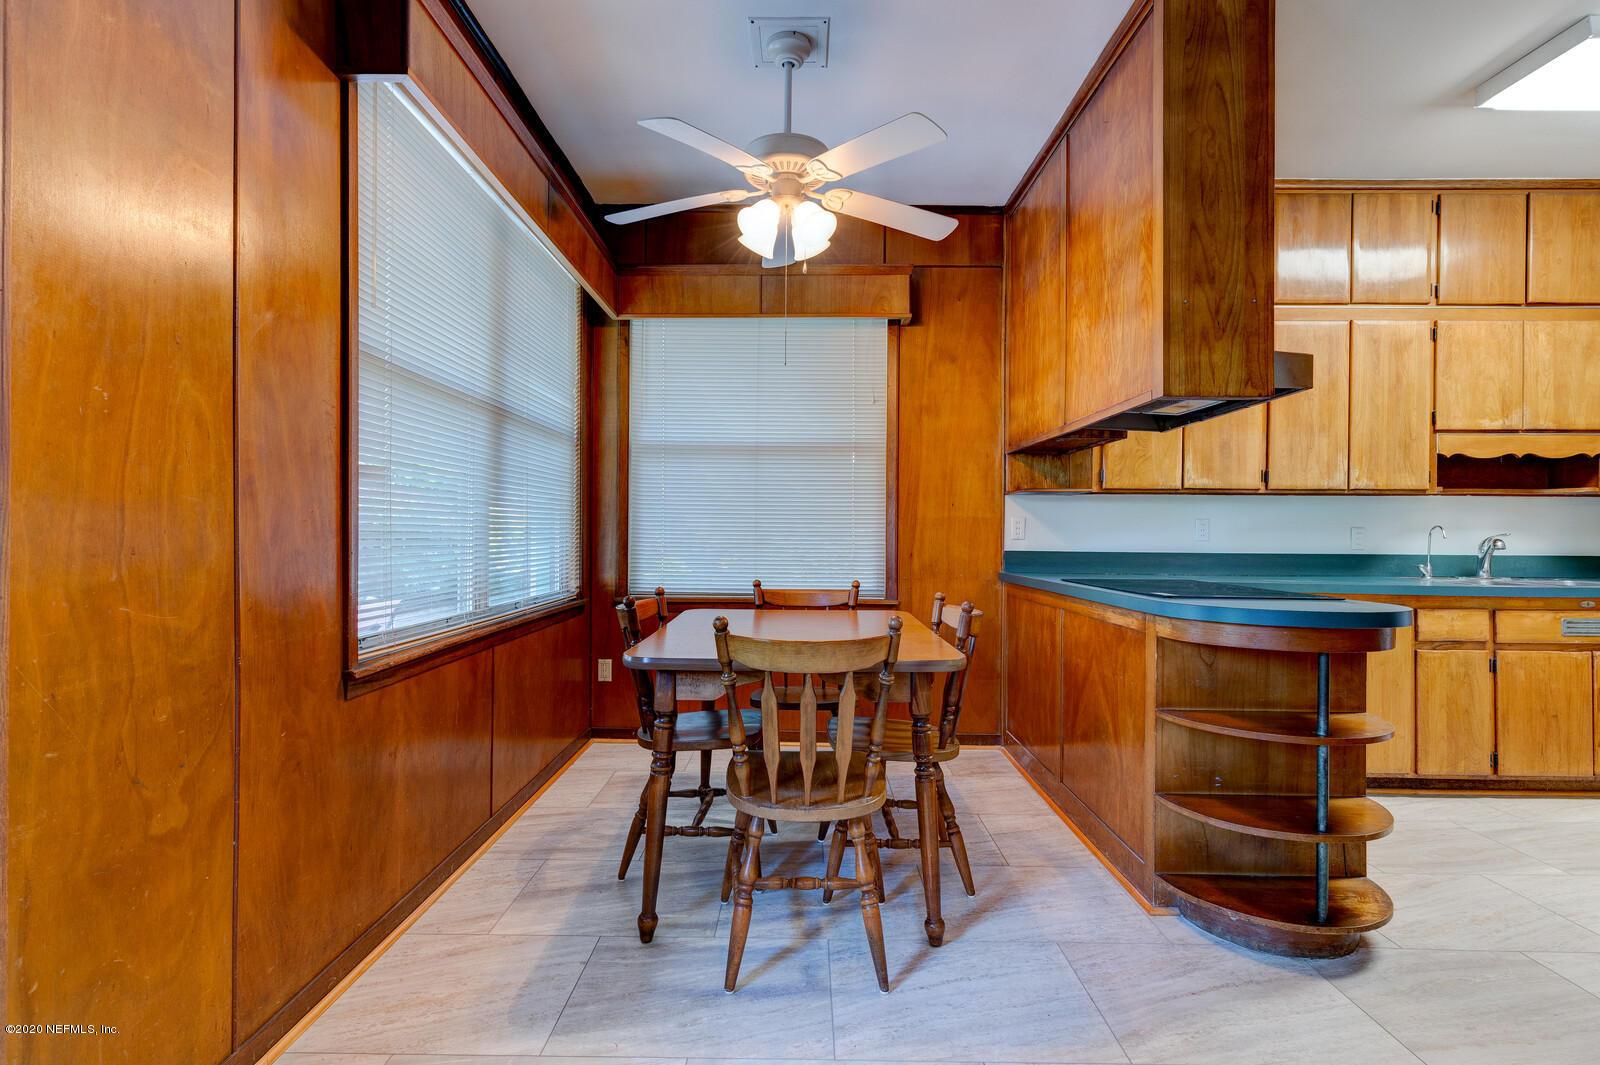 2425 IRONWOOD, JACKSONVILLE, FLORIDA 32216, 4 Bedrooms Bedrooms, ,2 BathroomsBathrooms,Residential,For sale,IRONWOOD,1083445